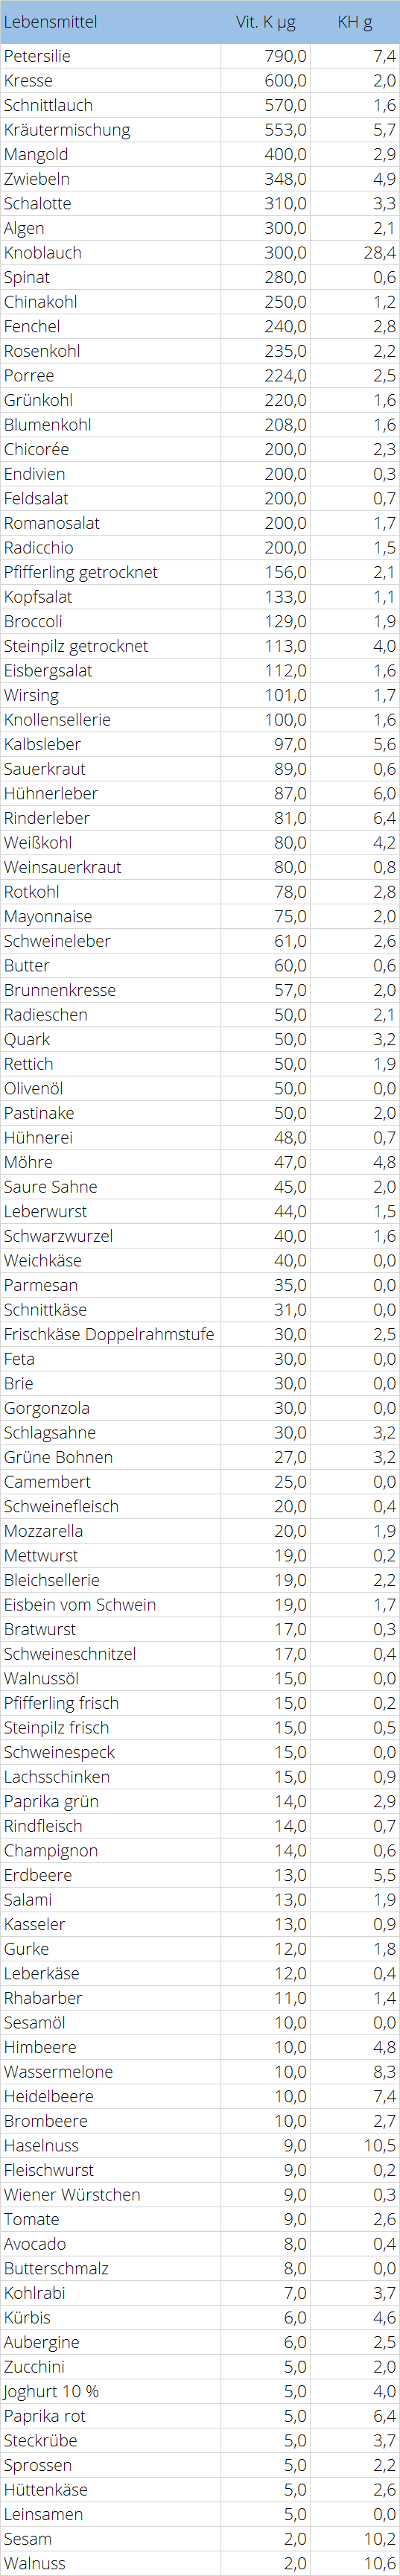 Vitamin K Tabelle LCHF Lebensmittel